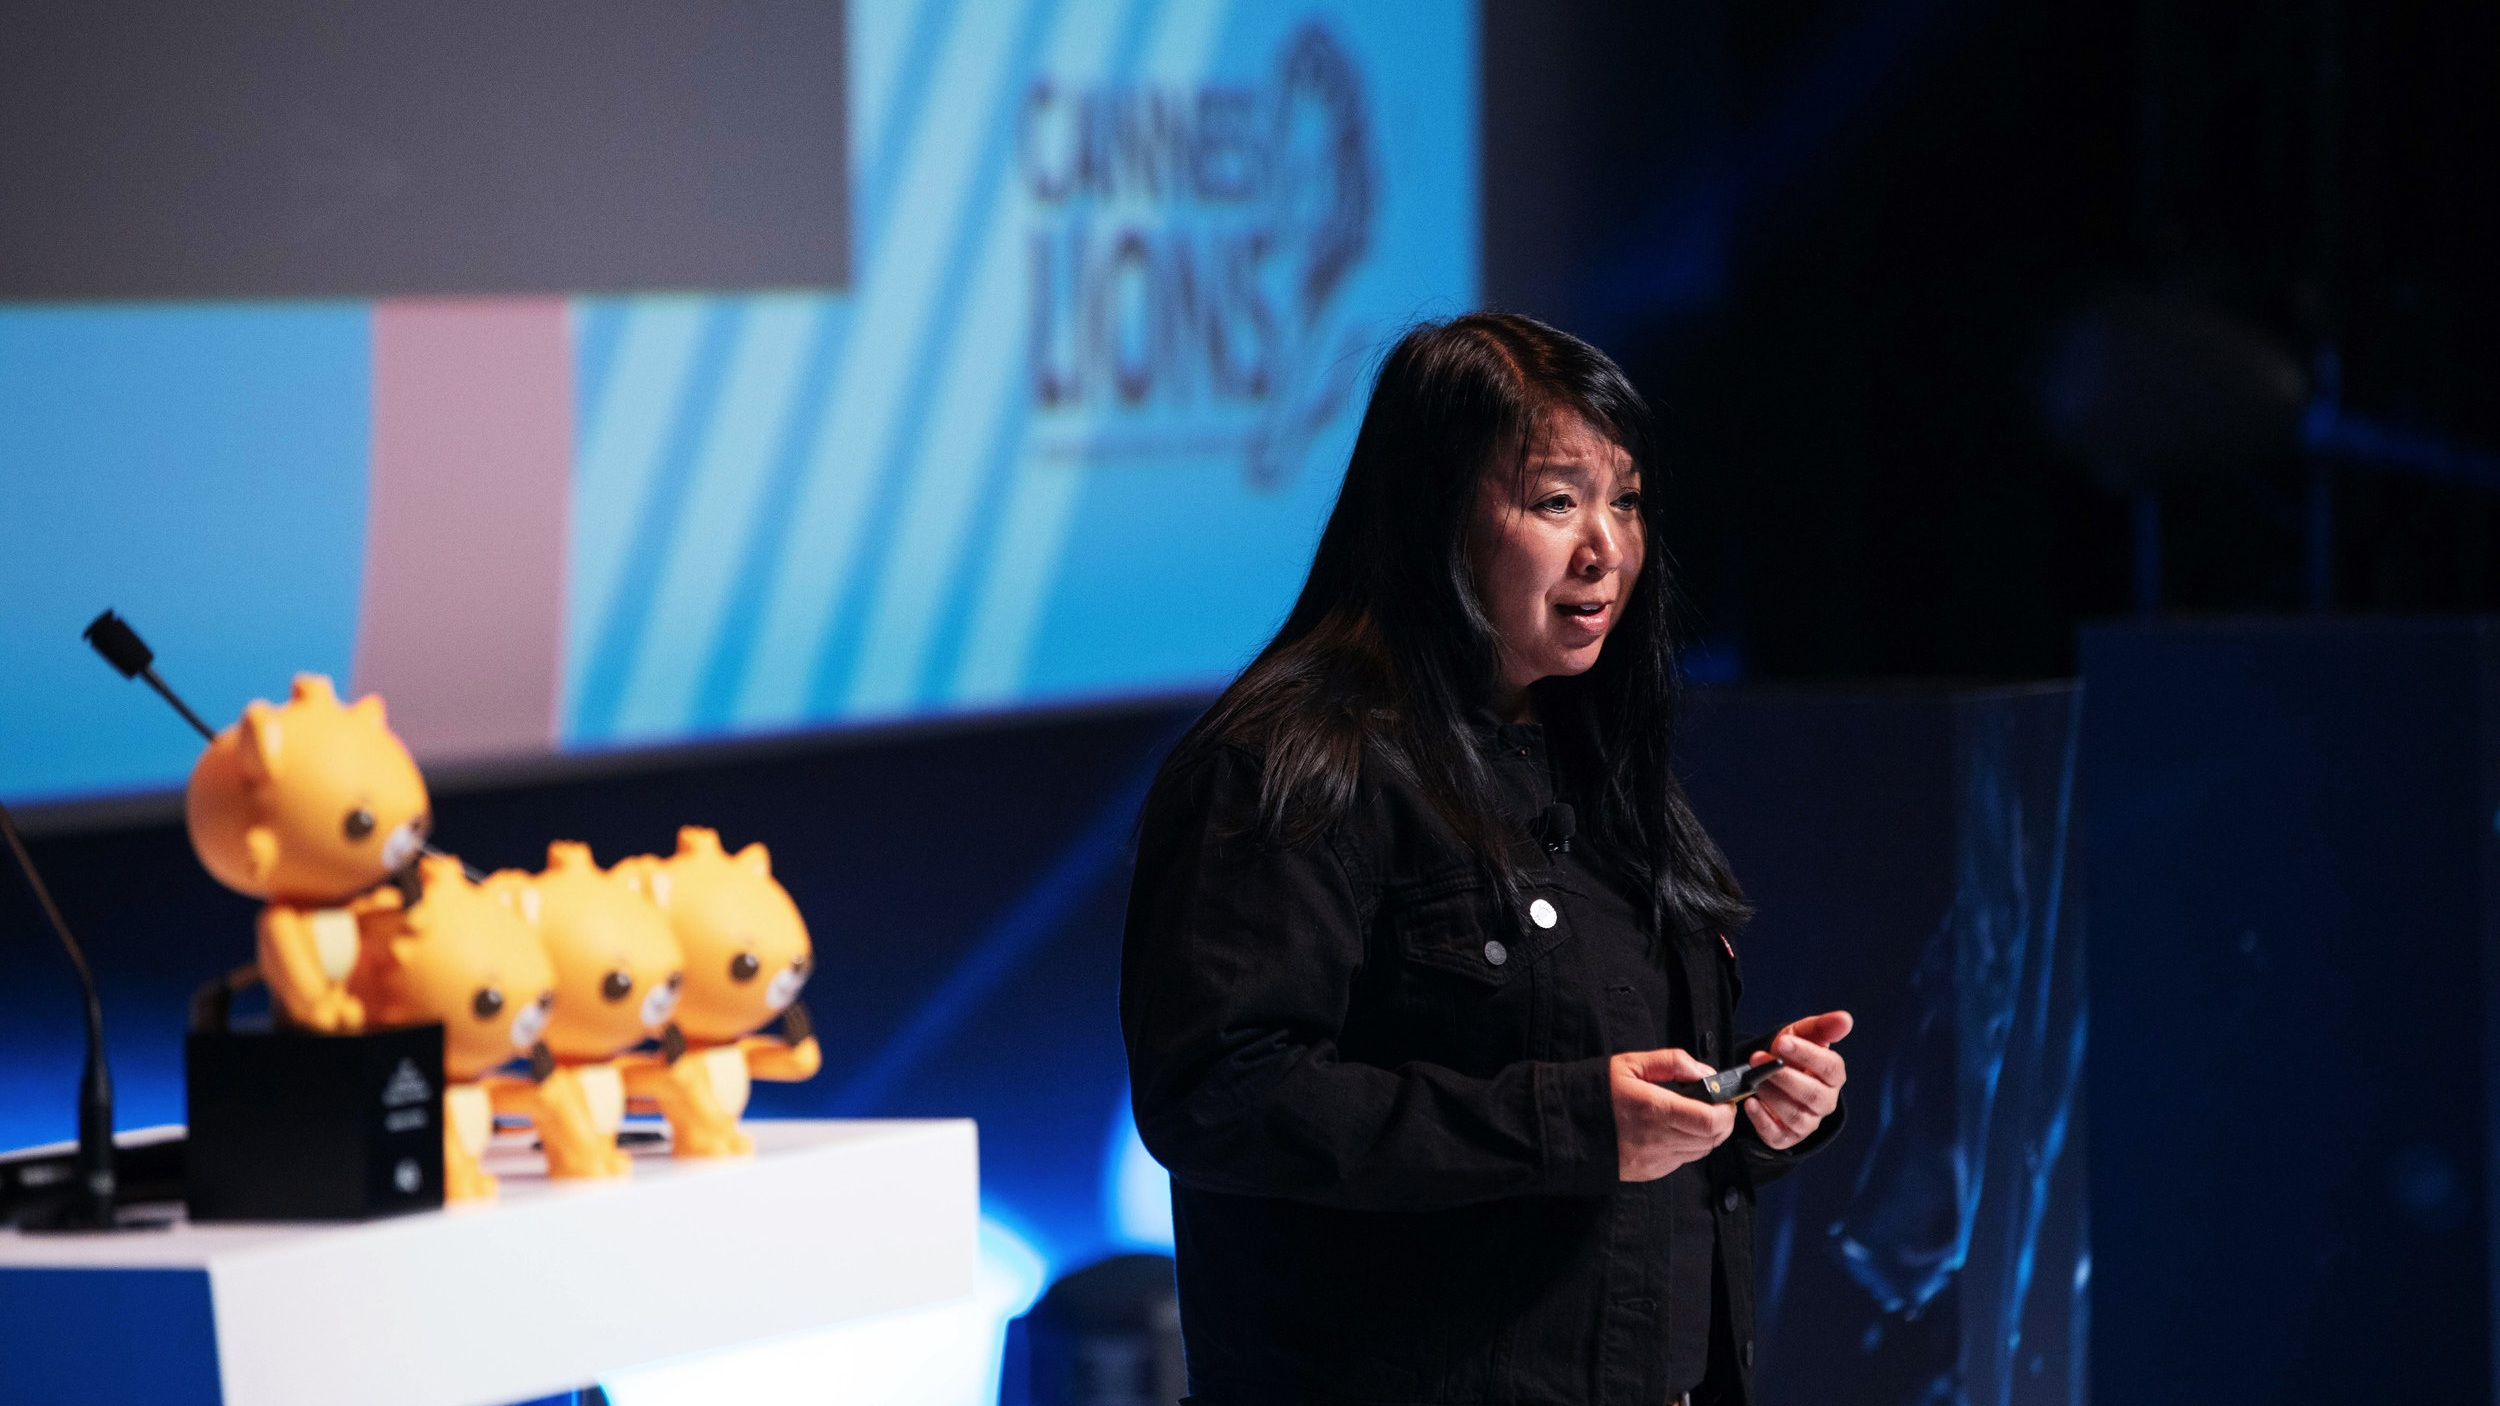 Cannes Lions International Festival of Creativity: Future Lions